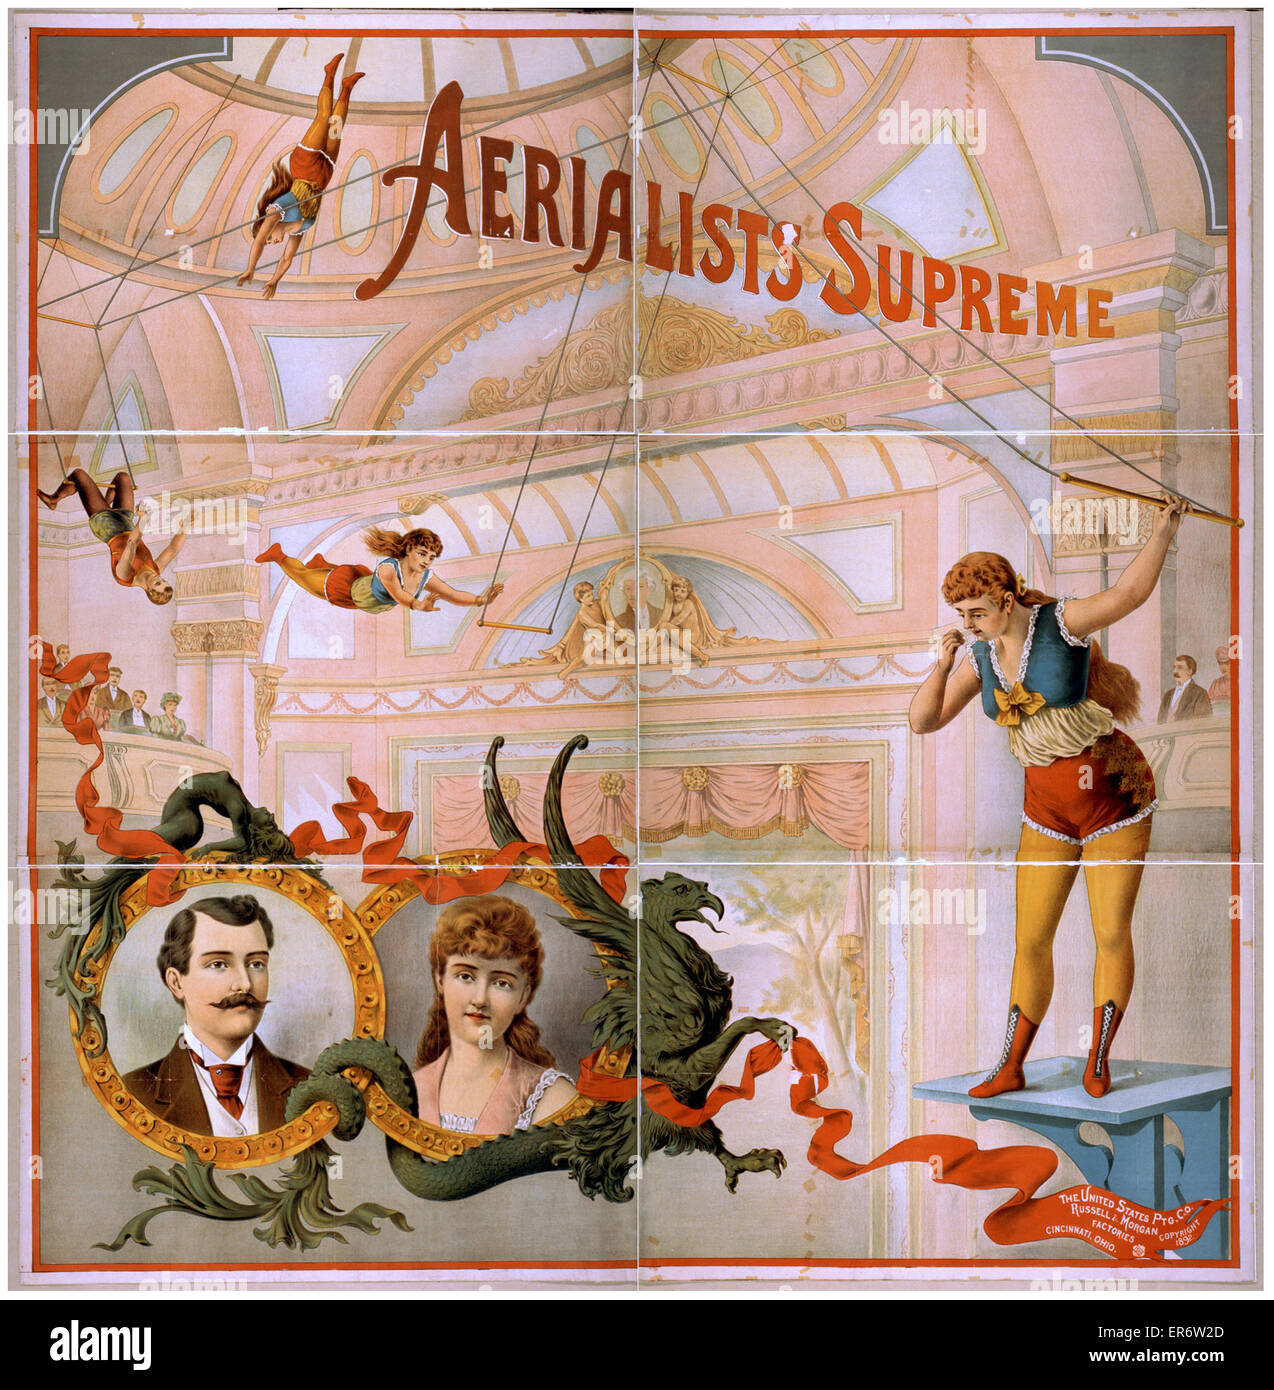 Aerialists supreme. Date c1892. - Stock Image